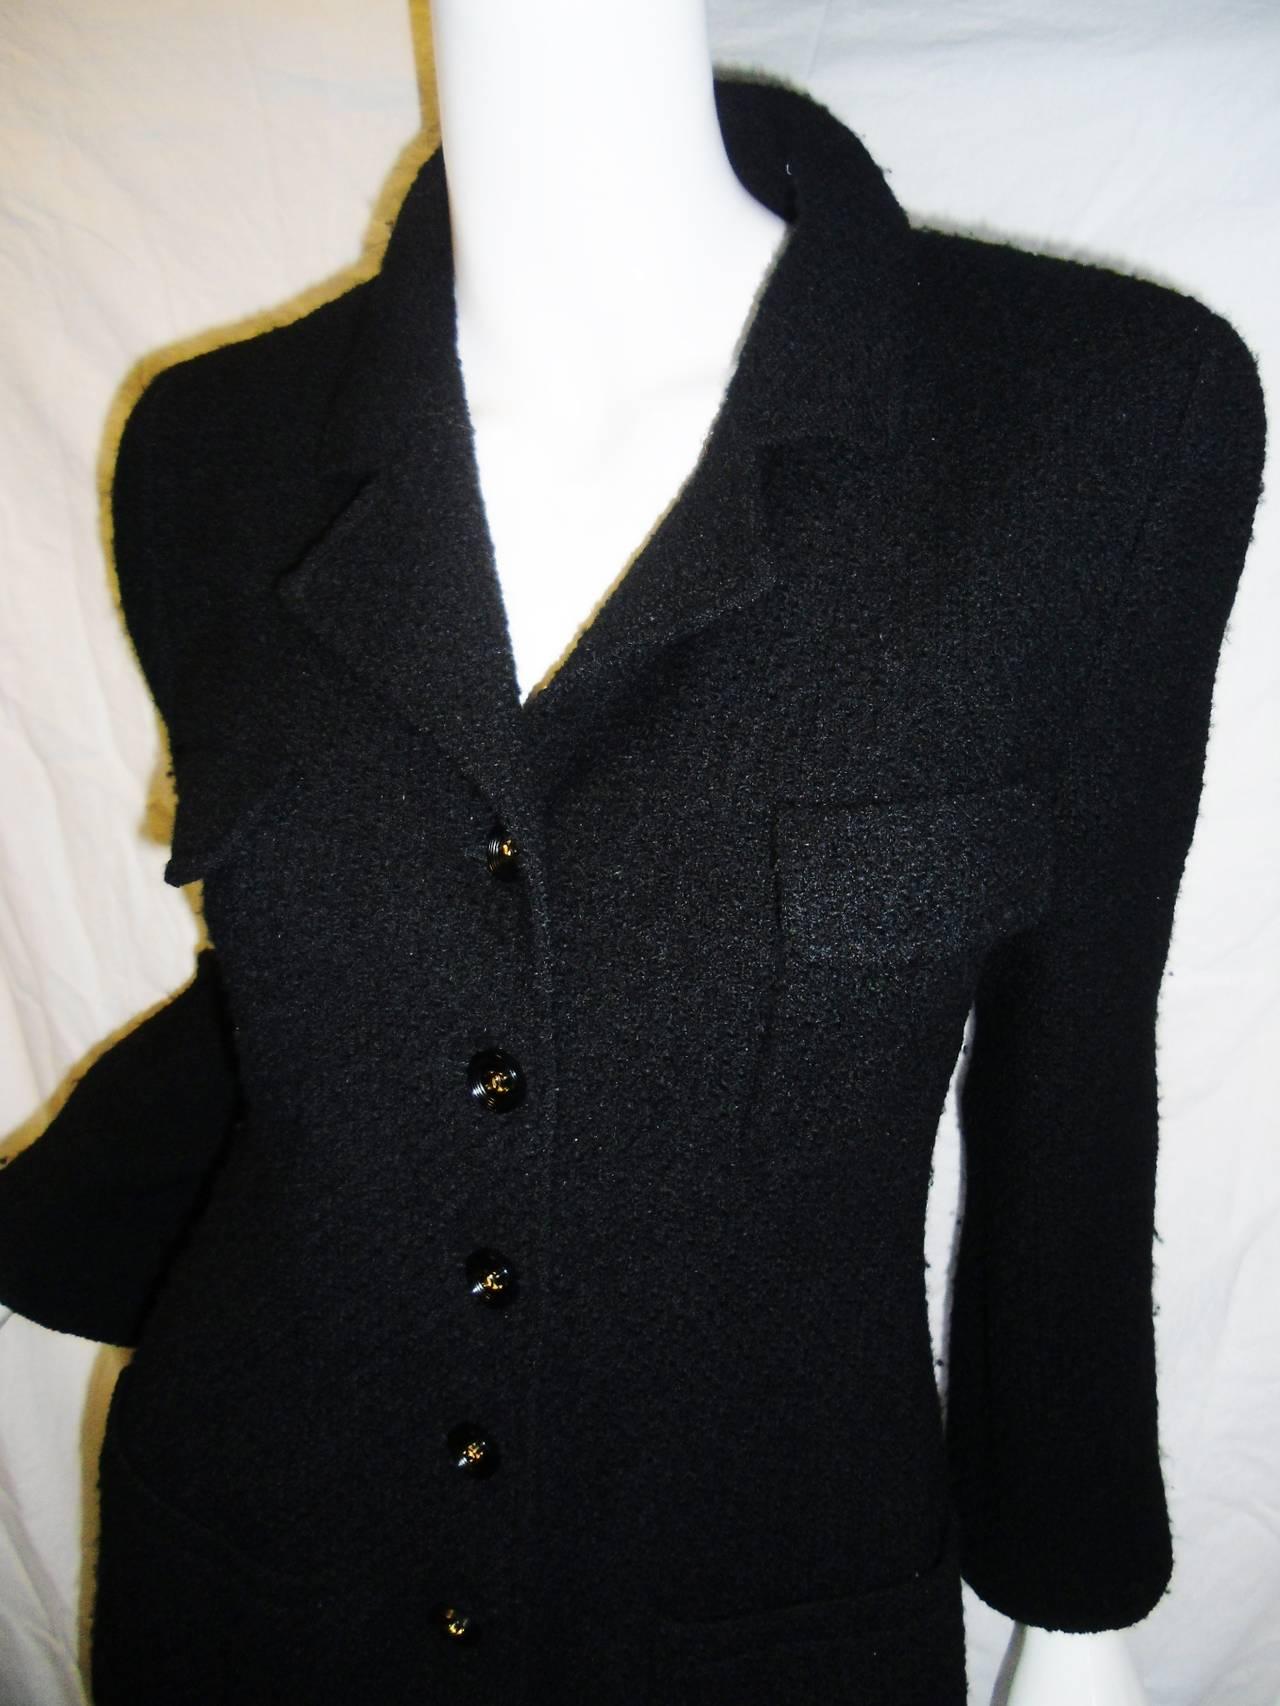 VINCE Grosgrain-Trimmed Black Boucle Jacket 4. CHLOE Sexy Black Boucle Textured Sleeveless Jacket Vest Women's size T $ Buy It Now. REBECCA TAYLOR Women's Purple Leather Trim Boucle Jacket Sz 2. New (Other) $ Buy It Now +$ shipping. ST JOHN BLACK & WHITE SINGLE BUTTON BOUCLE FALL JACKET SIZE 6.